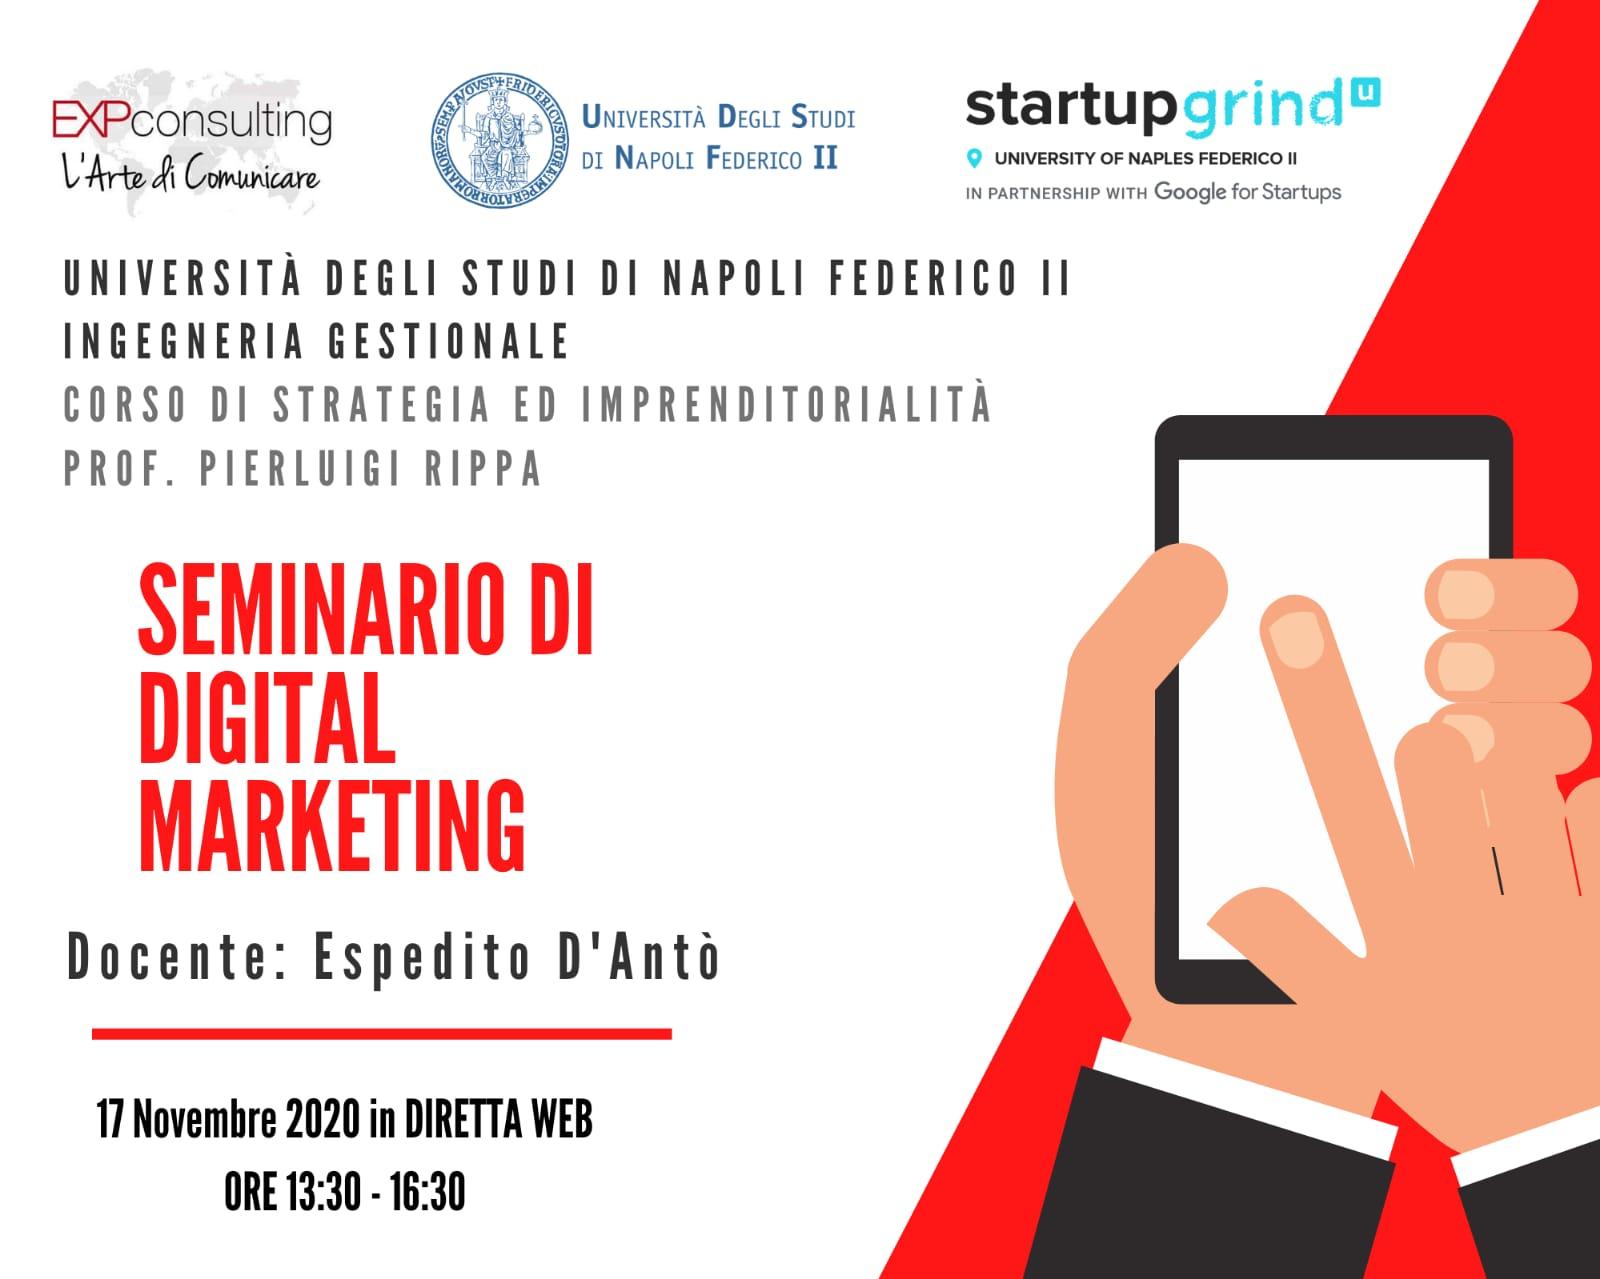 Seminario di Digital Marketing Federico II